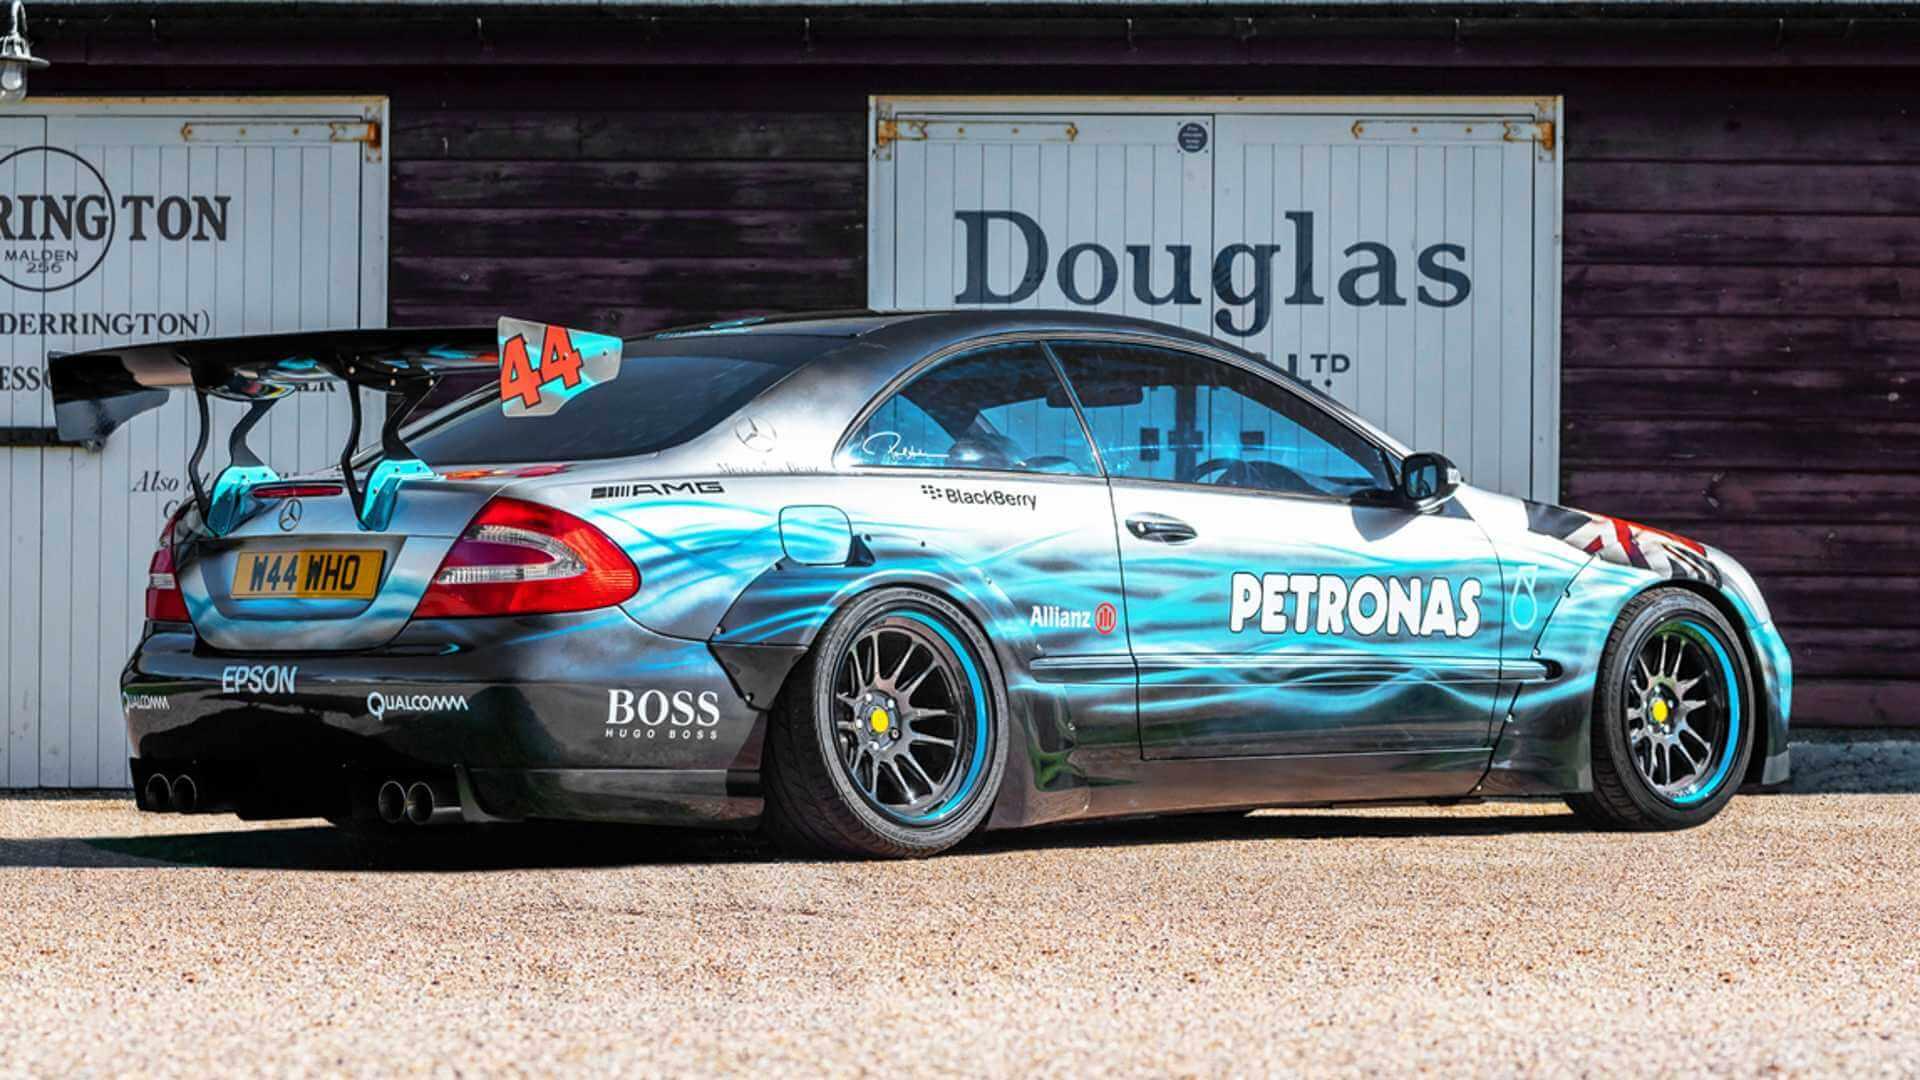 Mercedes-Benz CLK tributo a Lewis Hamilton